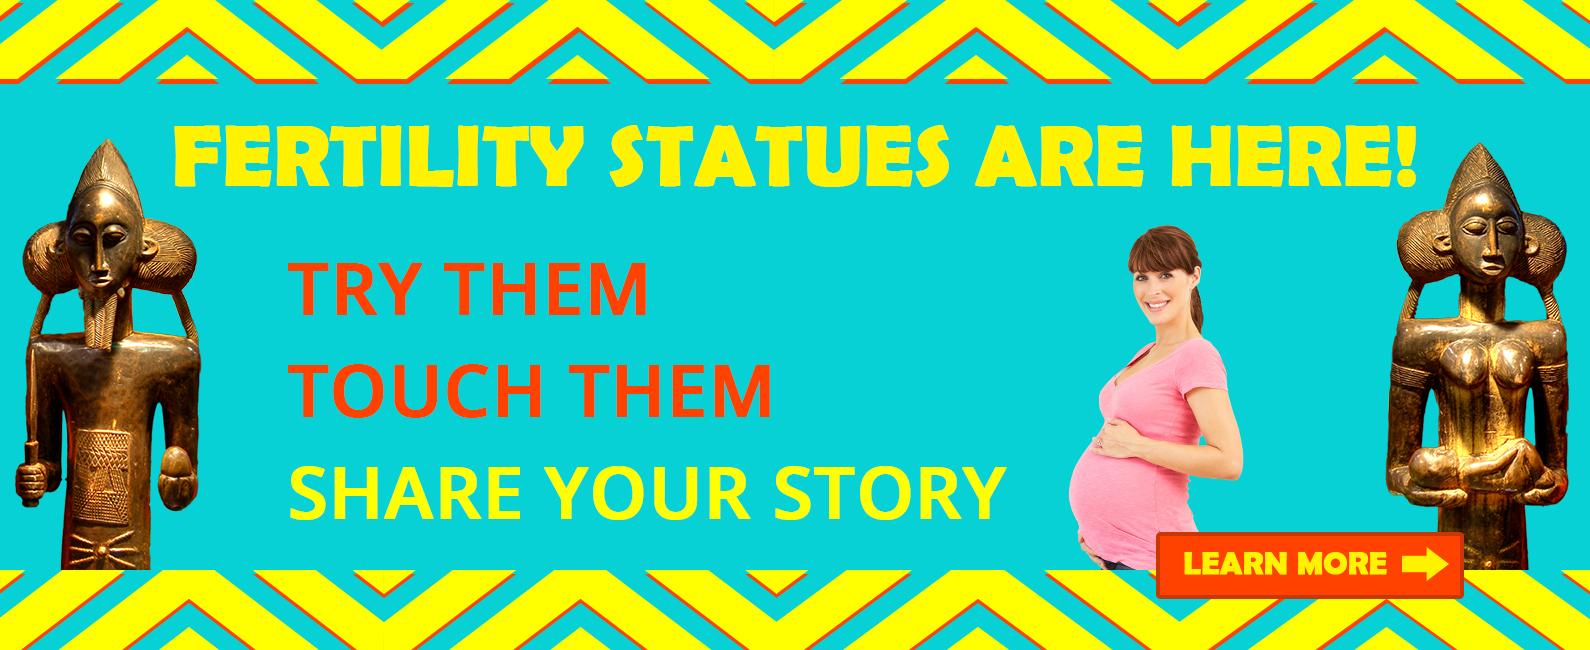 Fertility-Statues-2